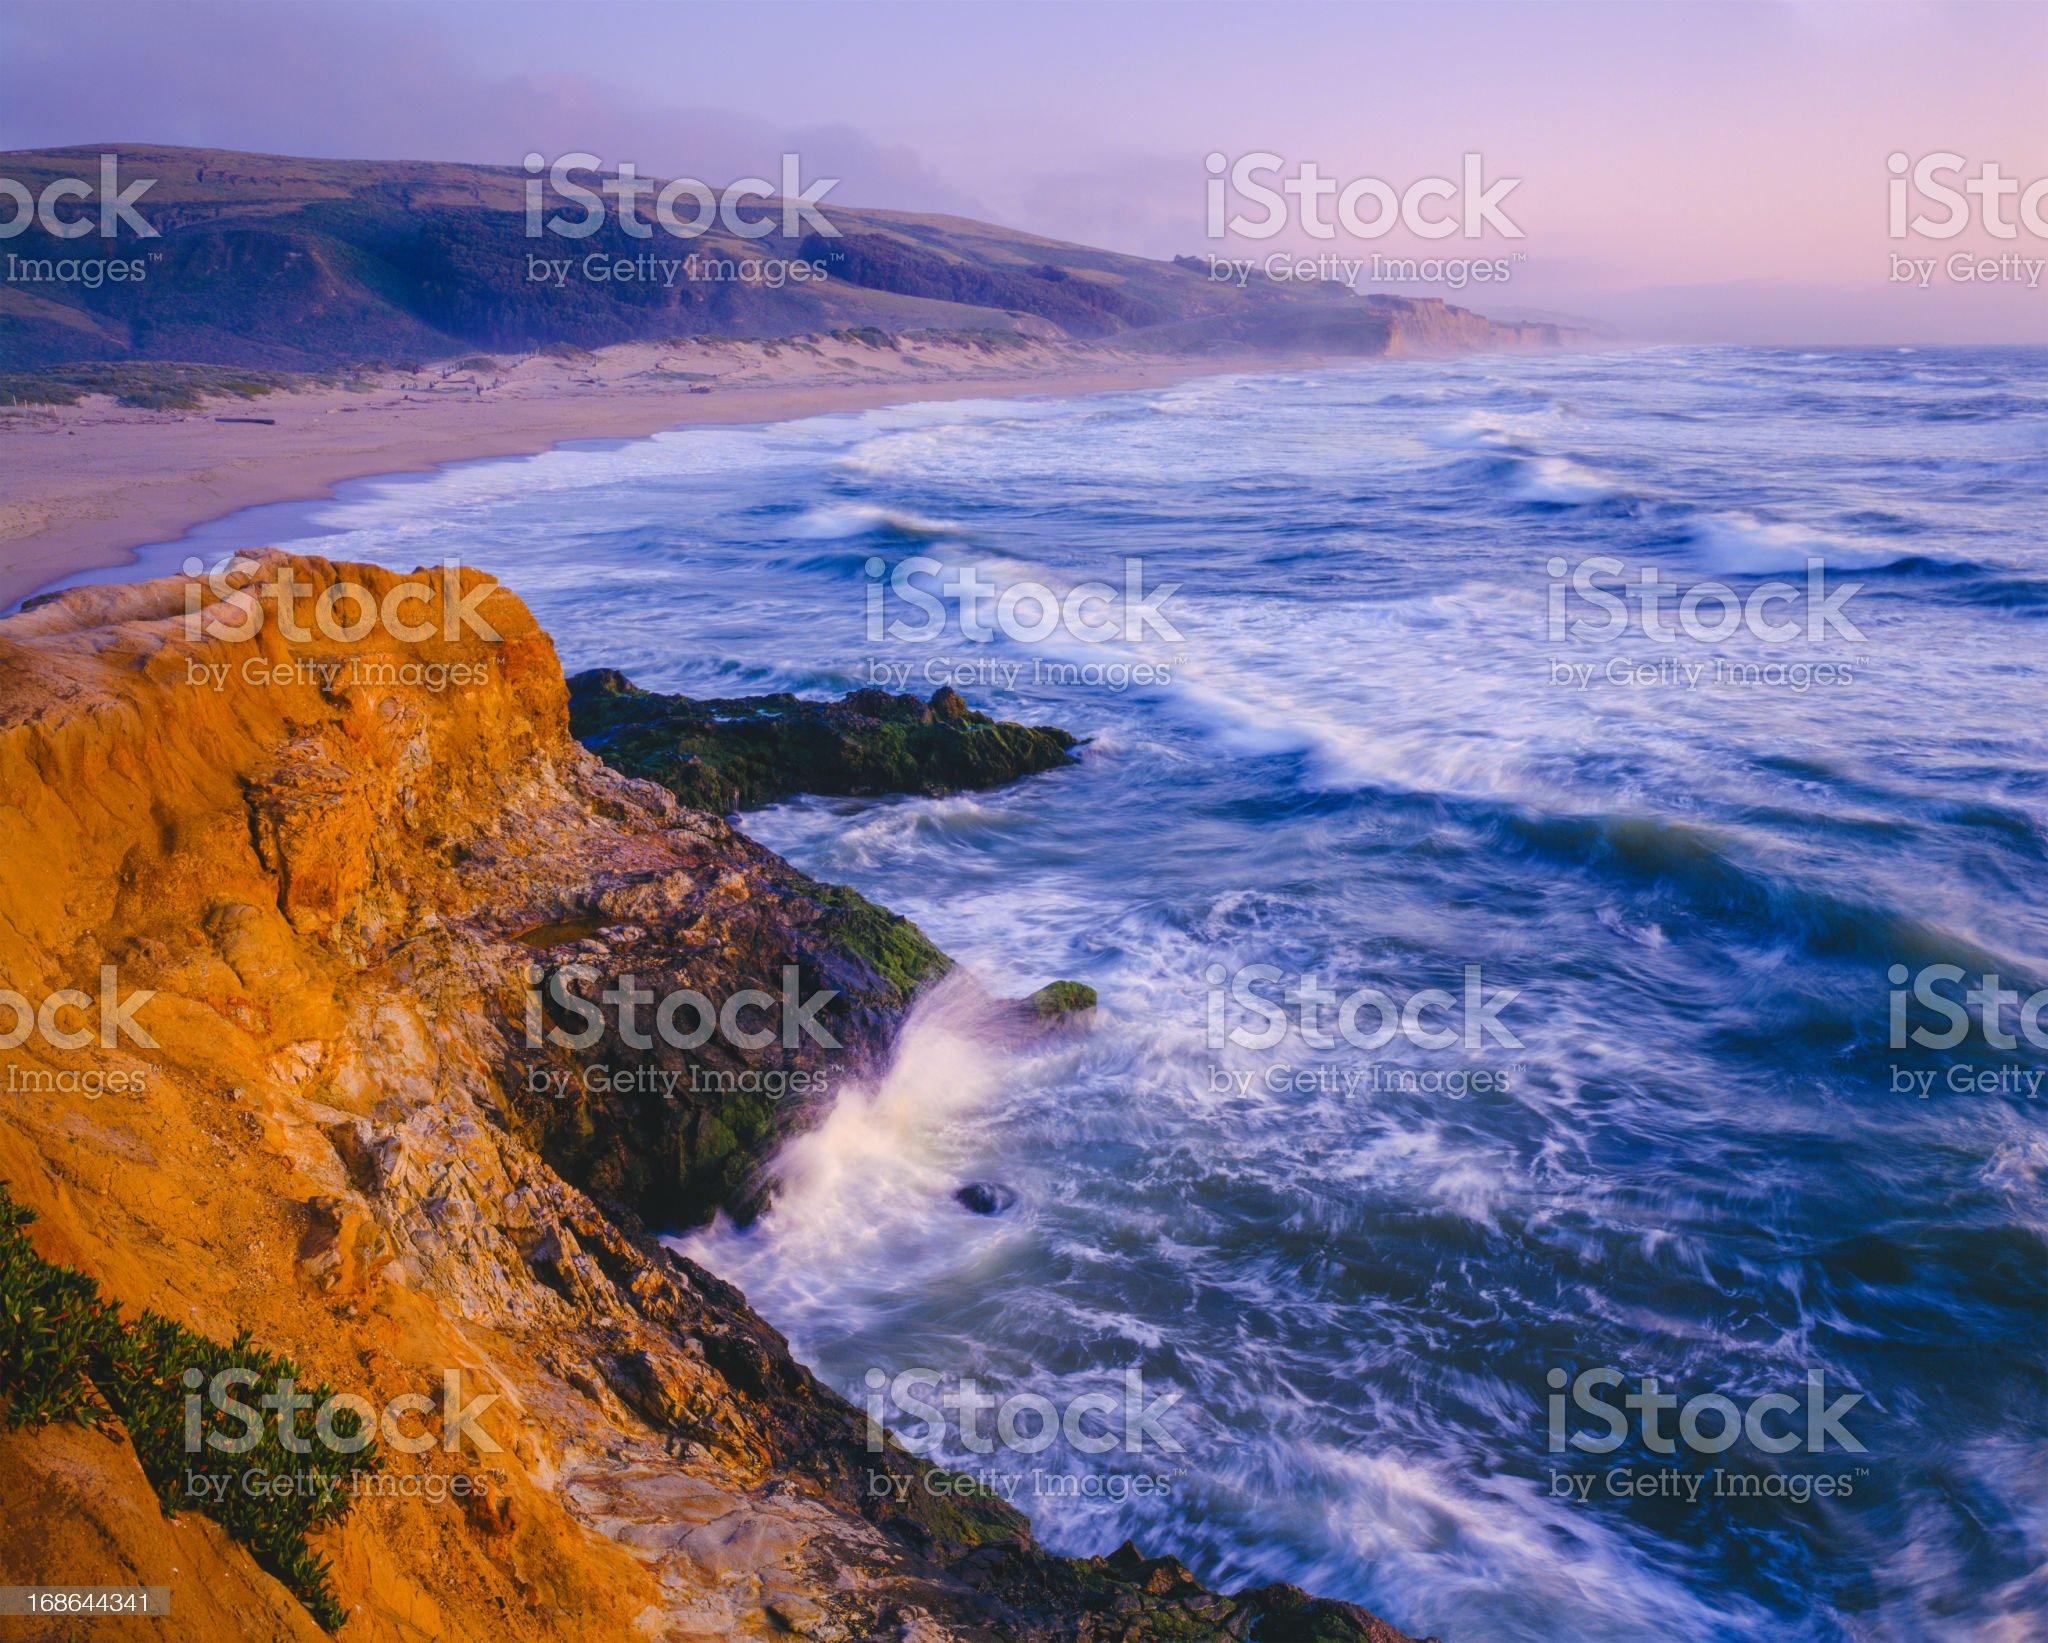 Dusk at Pescadero State Beach, California Coastline royalty-free stock photo